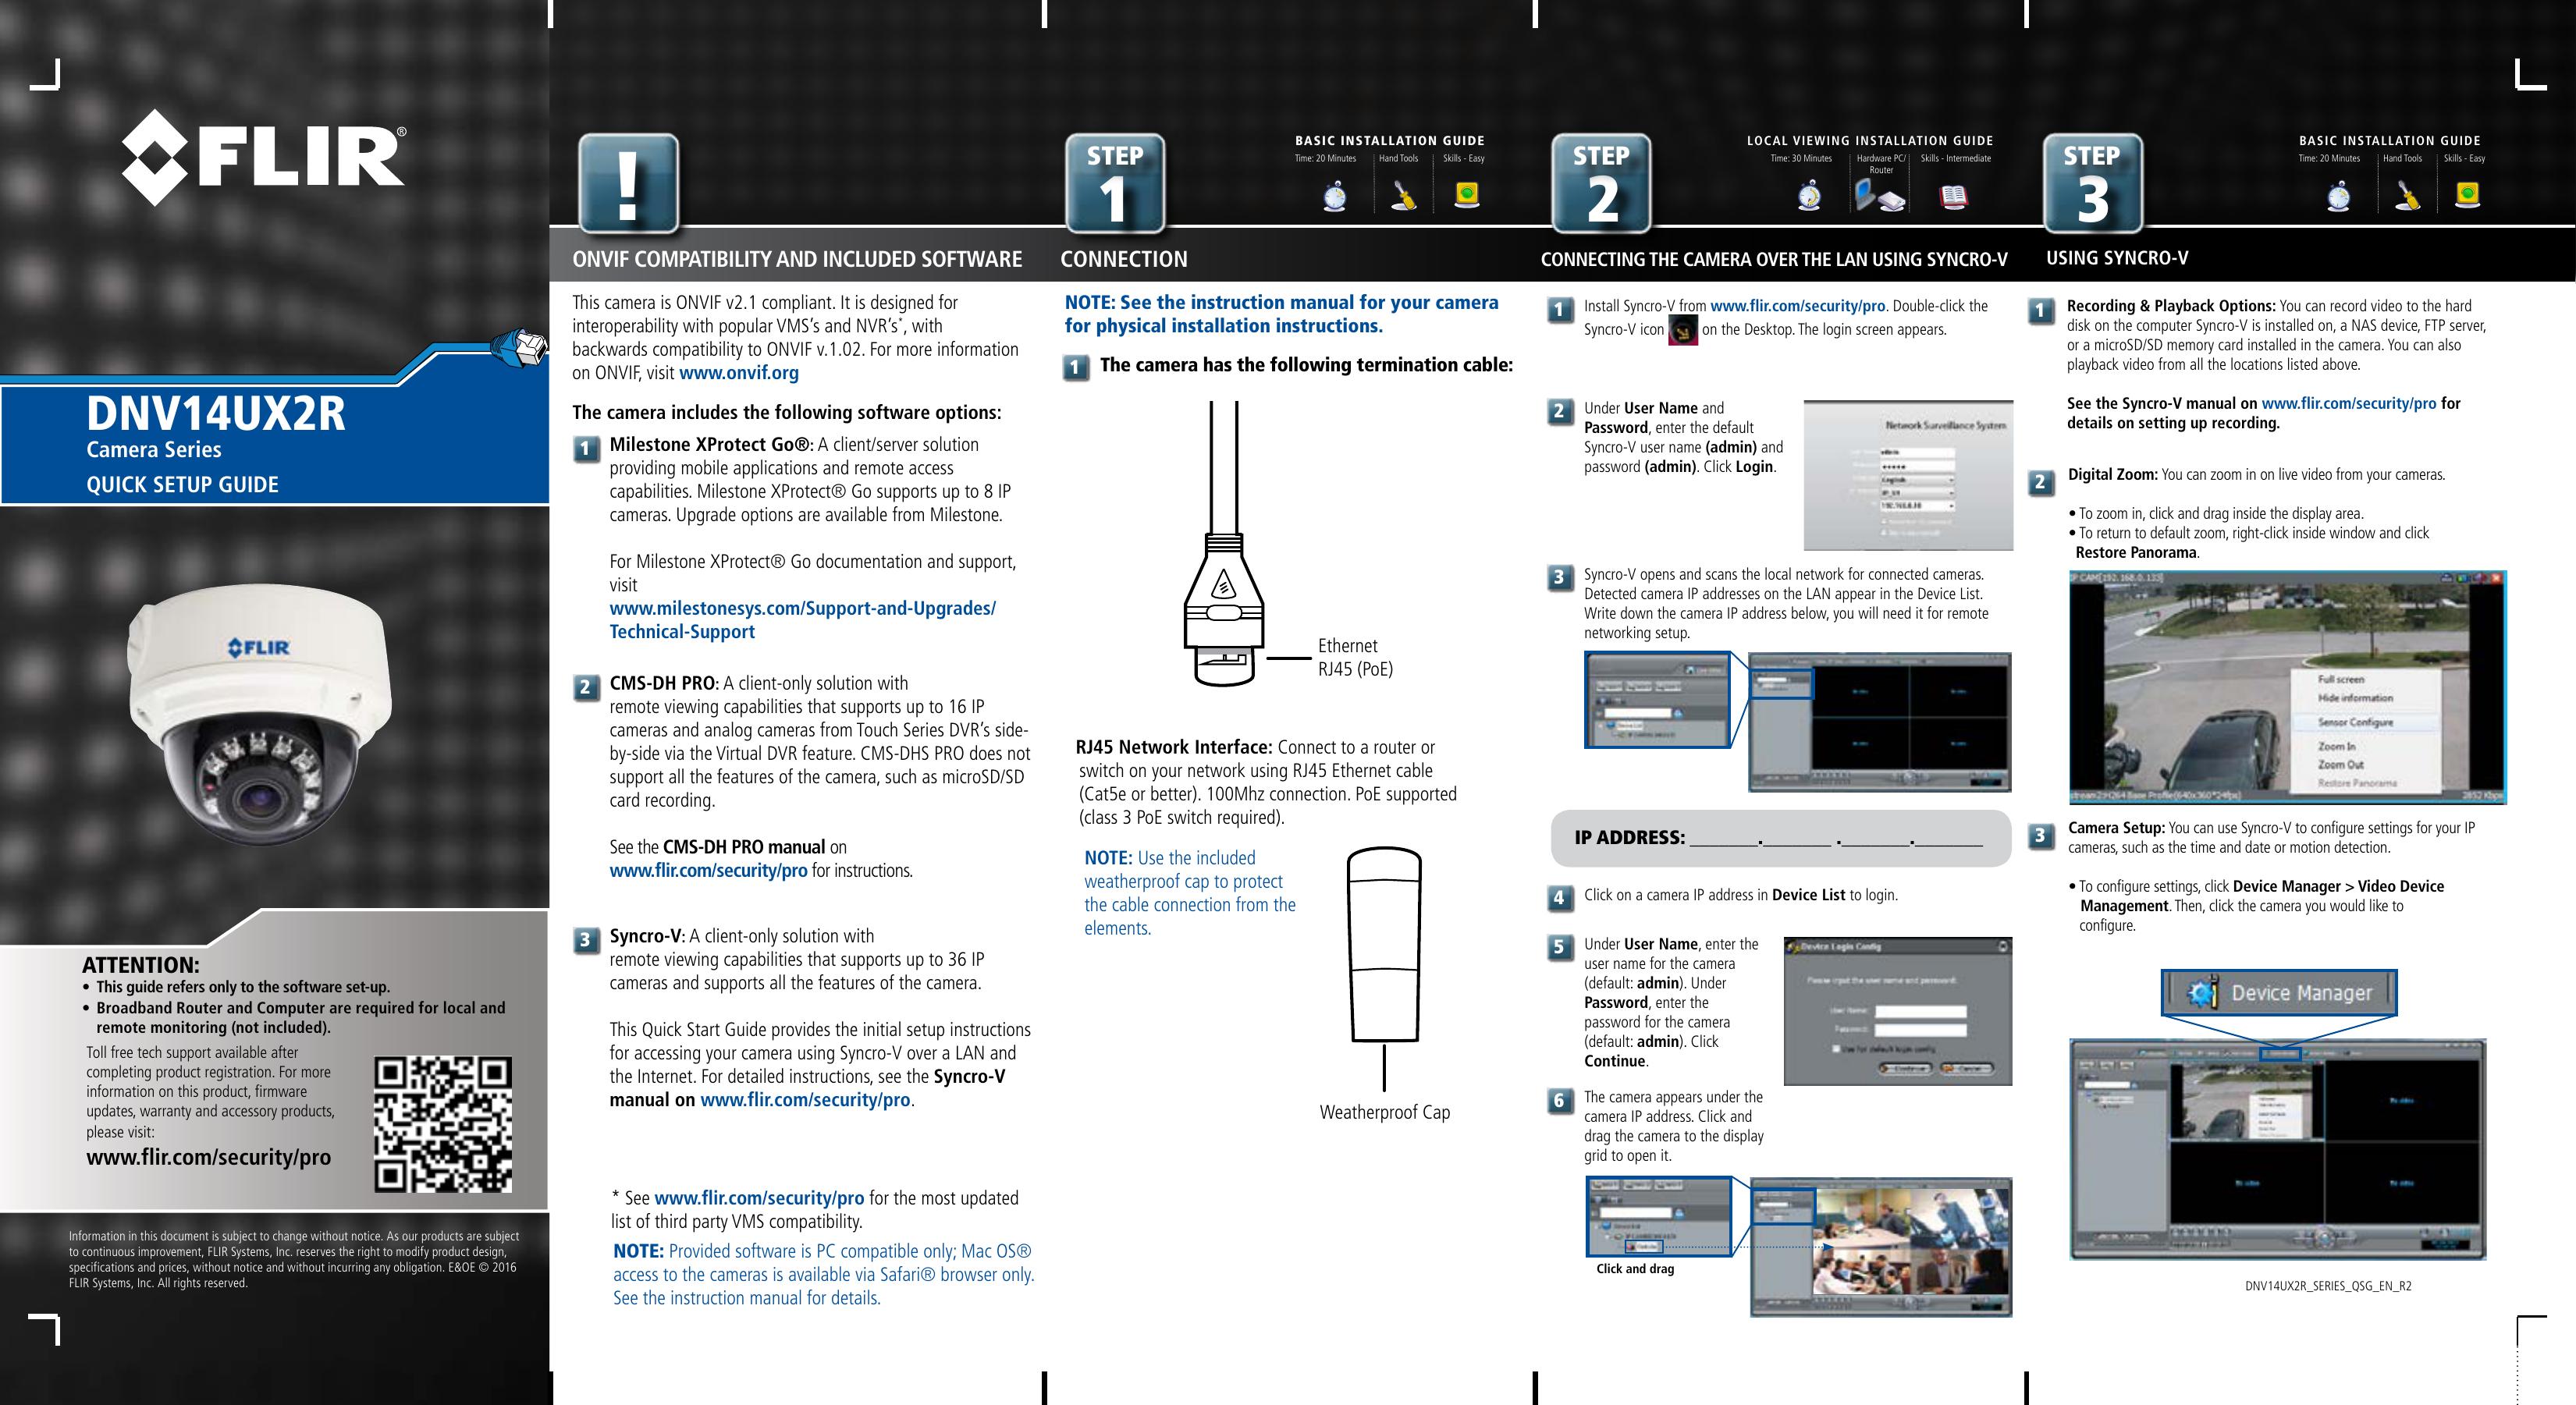 Syncro IP - FLIR Systems | manualzz com